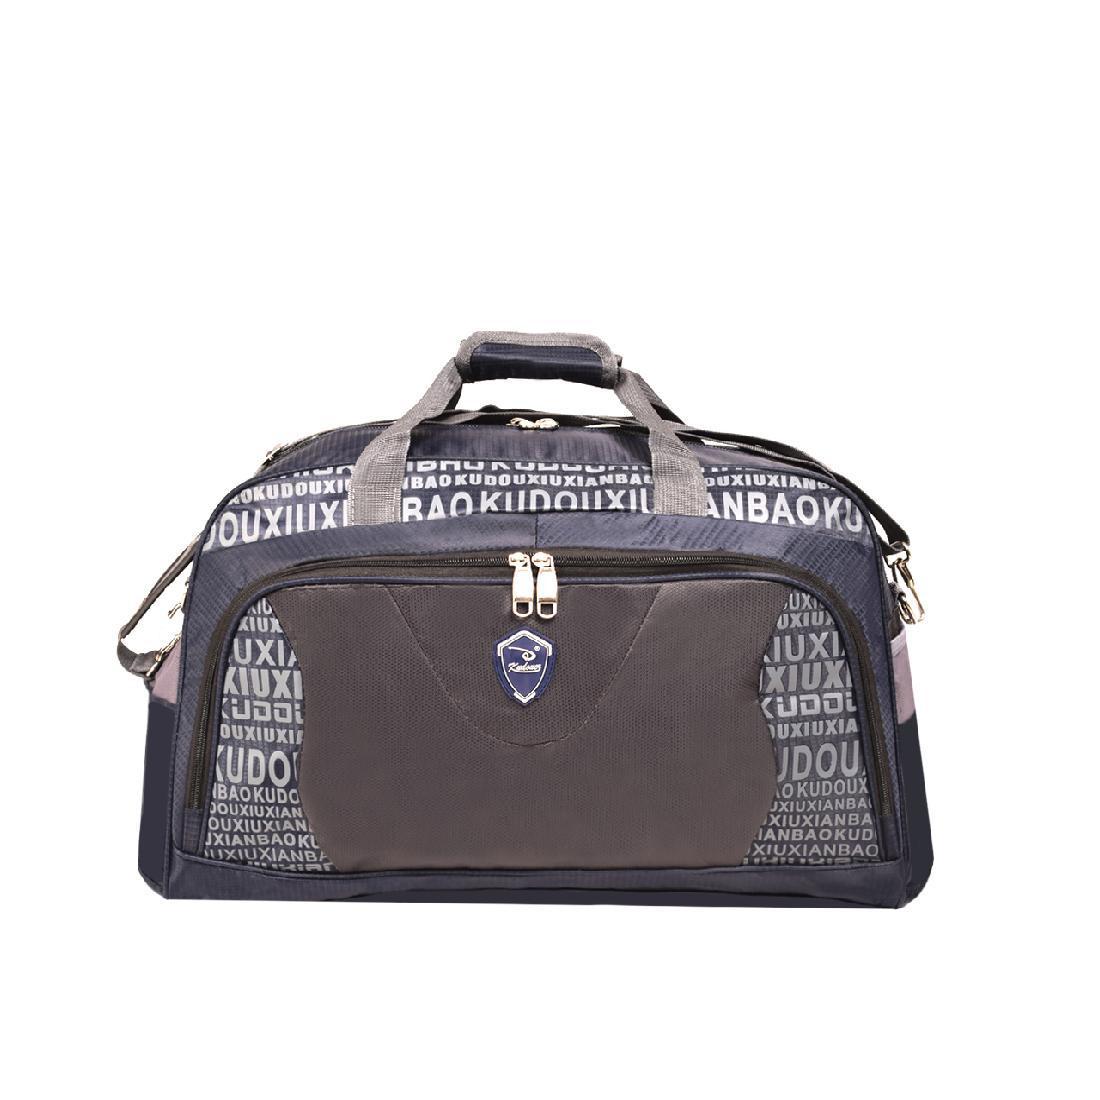 Дорожная сумка Kudouer (нейлон)  50х33х23 цвет синий  кс1215Всин